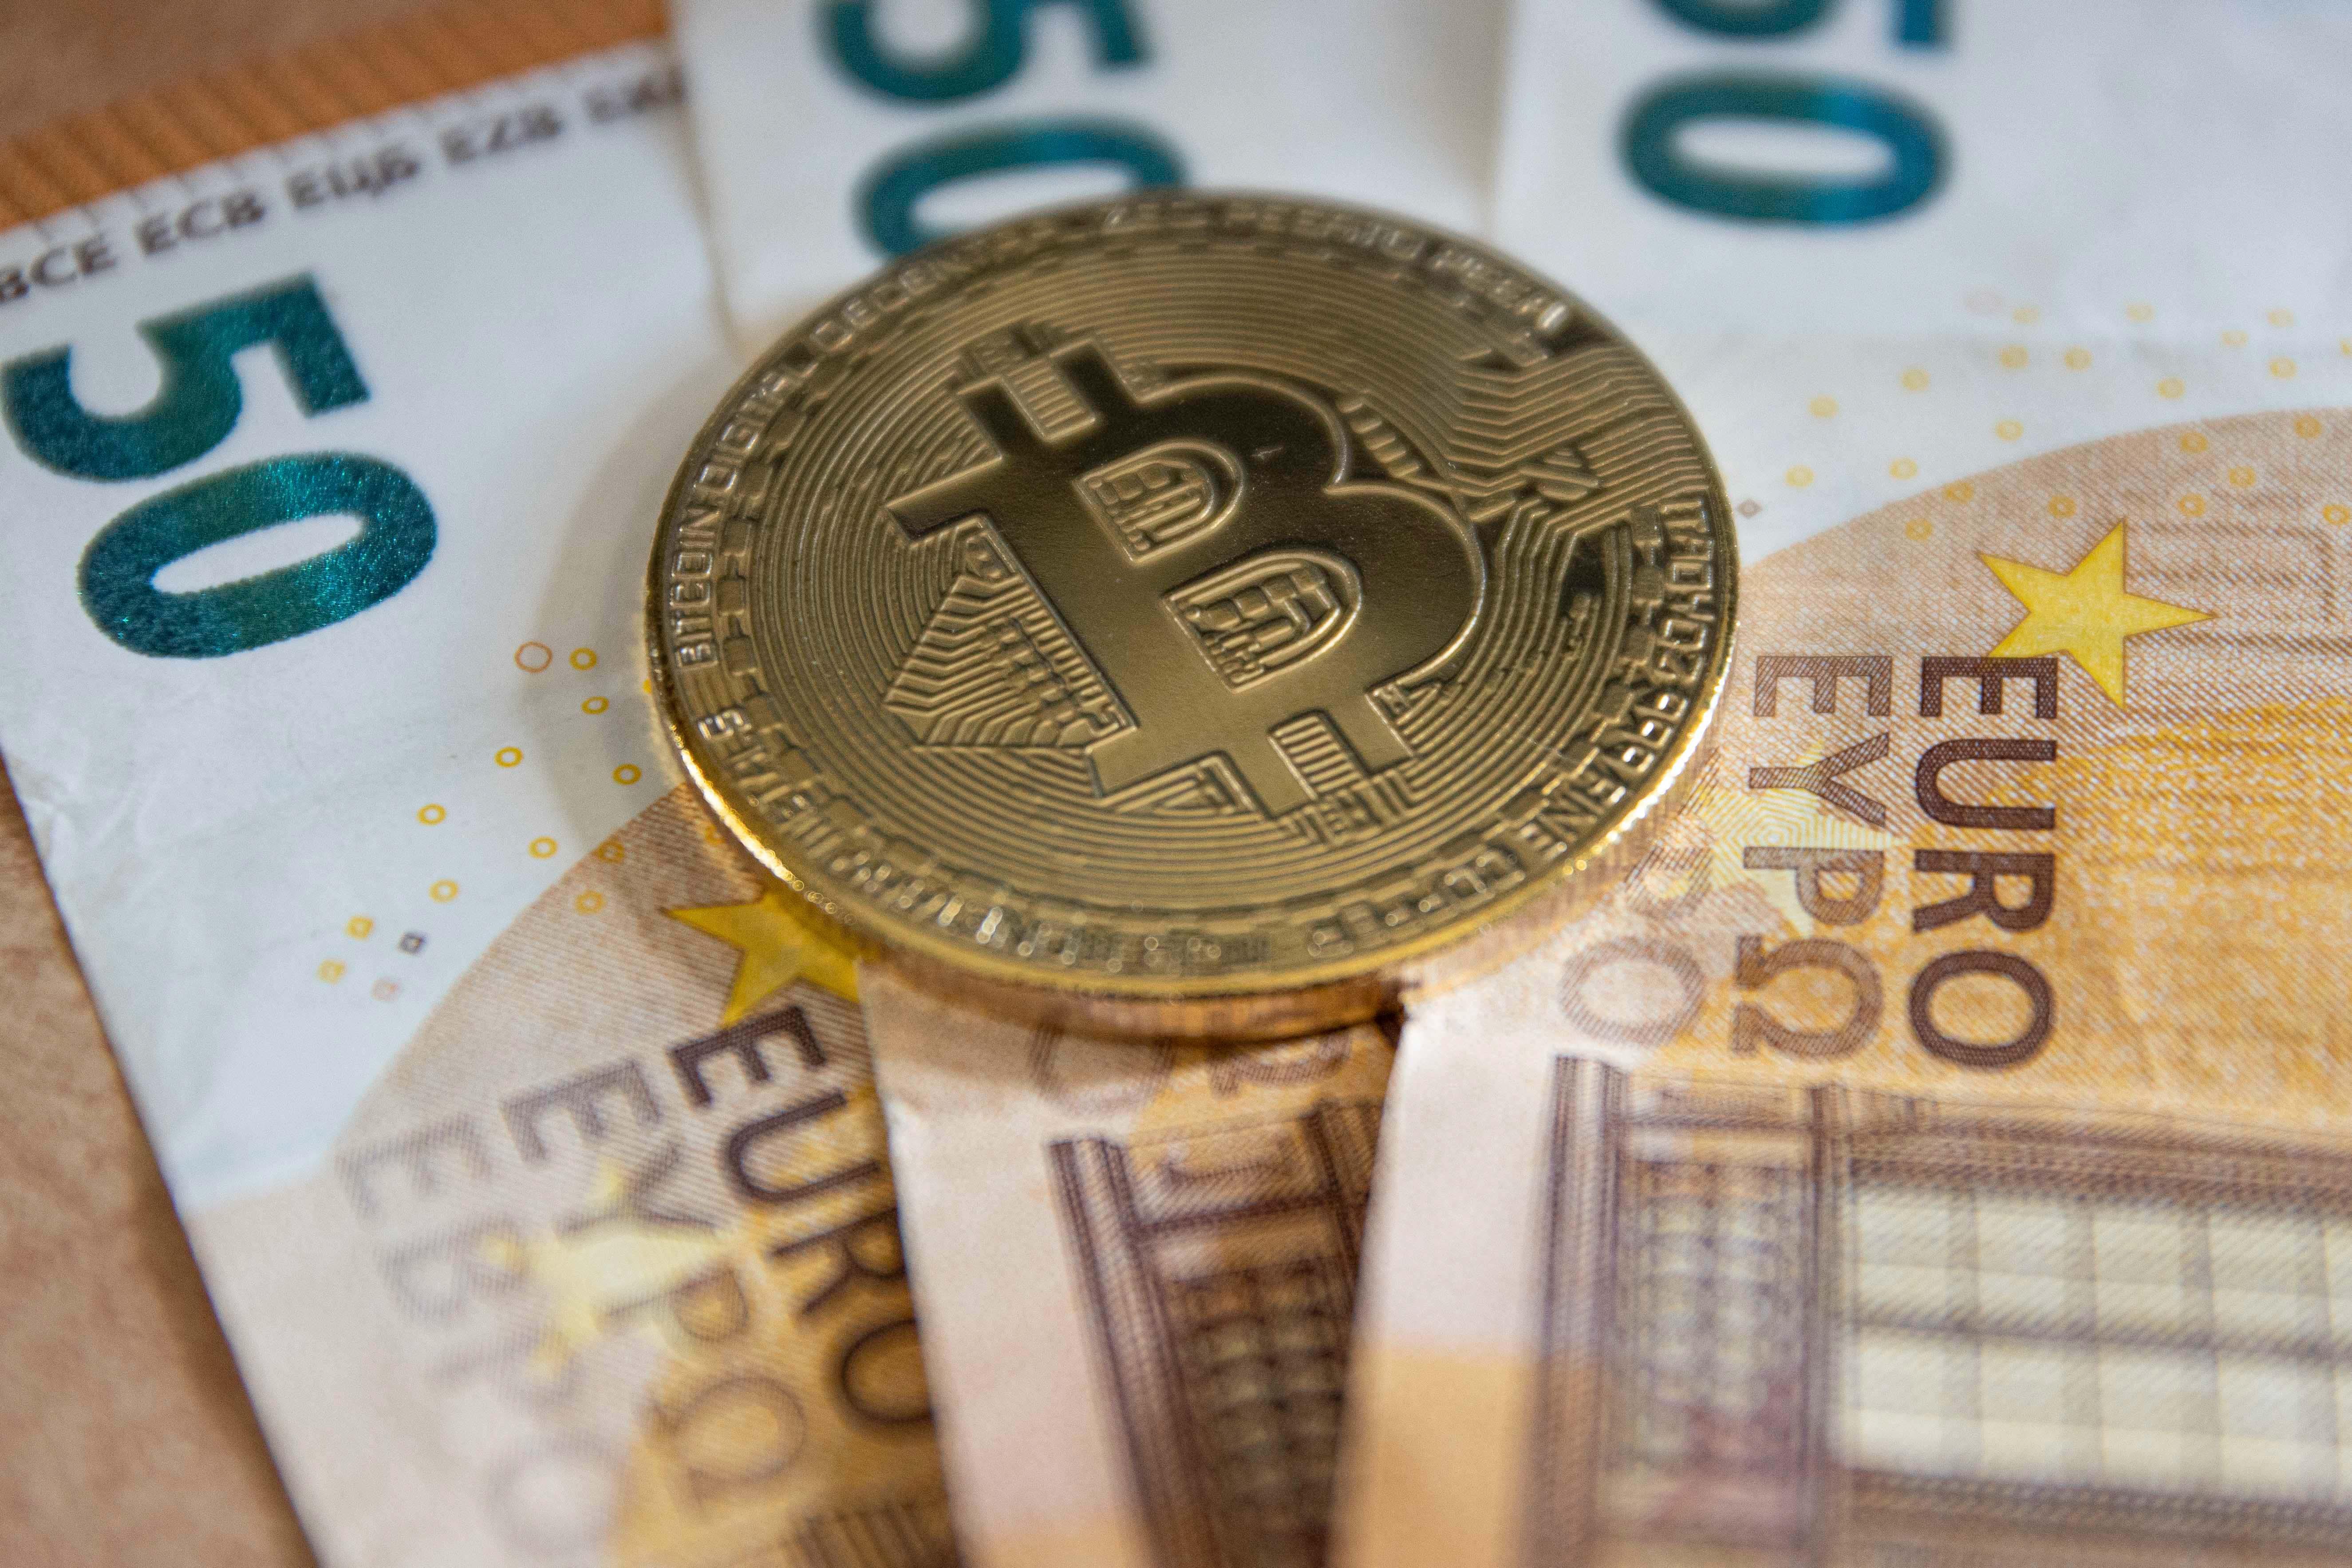 Bitcoin Illustration On Euro Banknotes